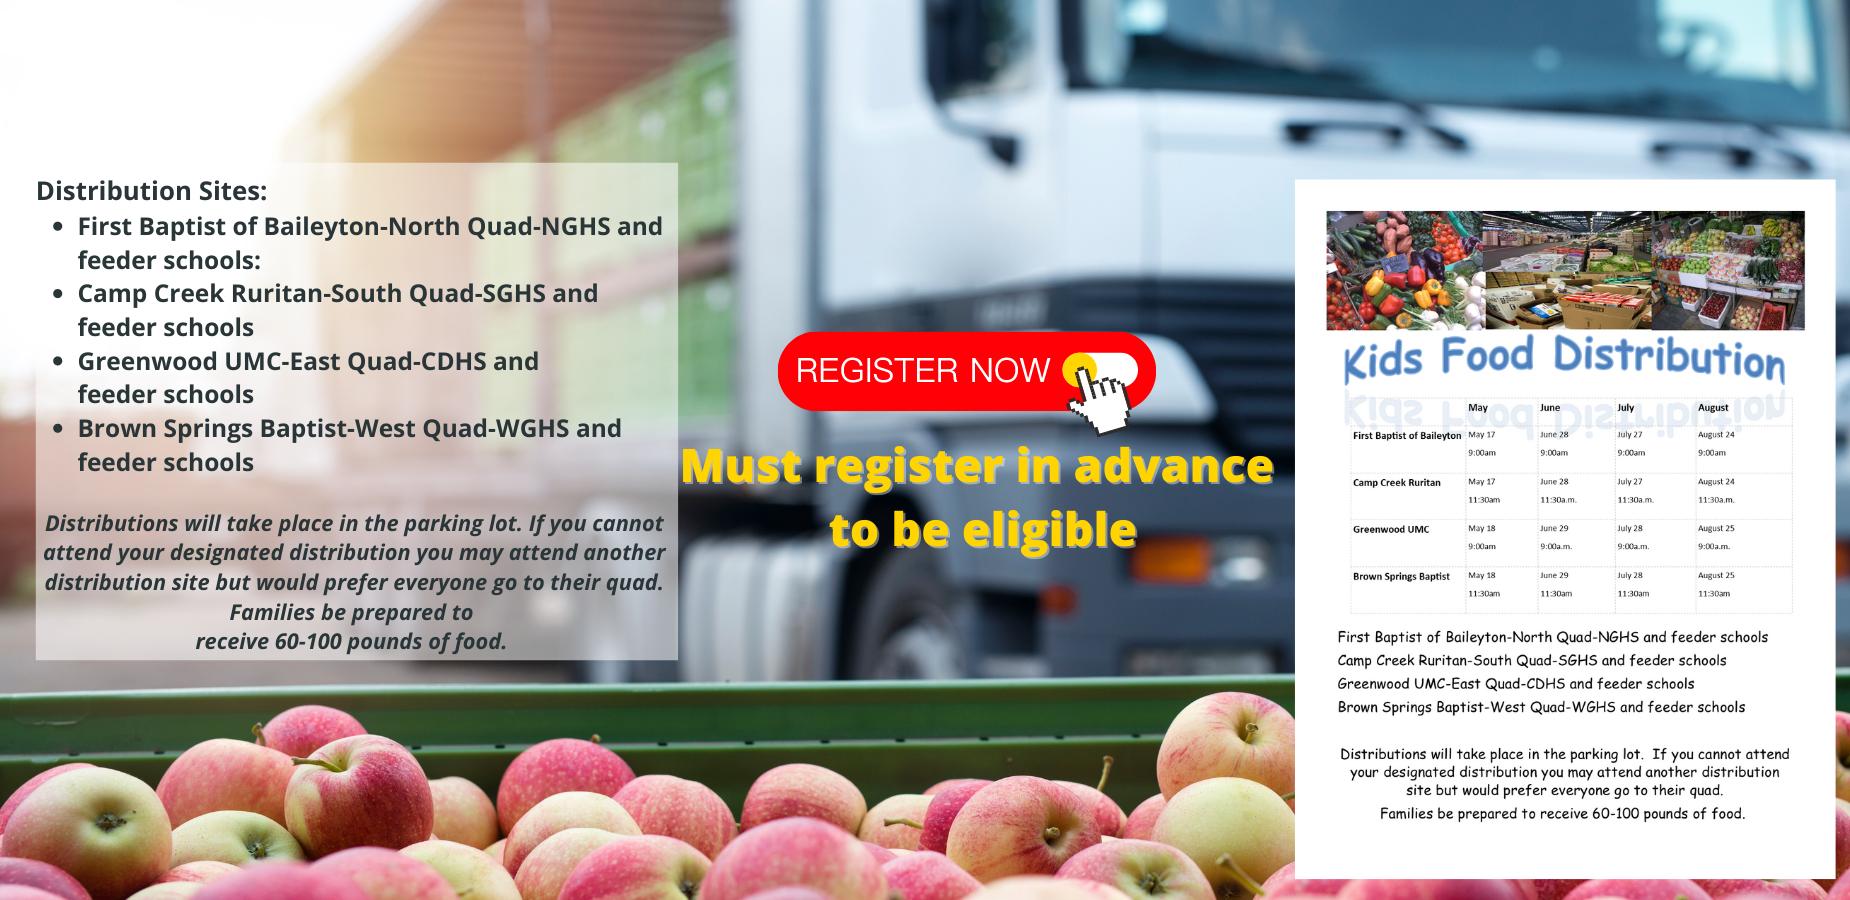 Food For Kids May Distribution Registration